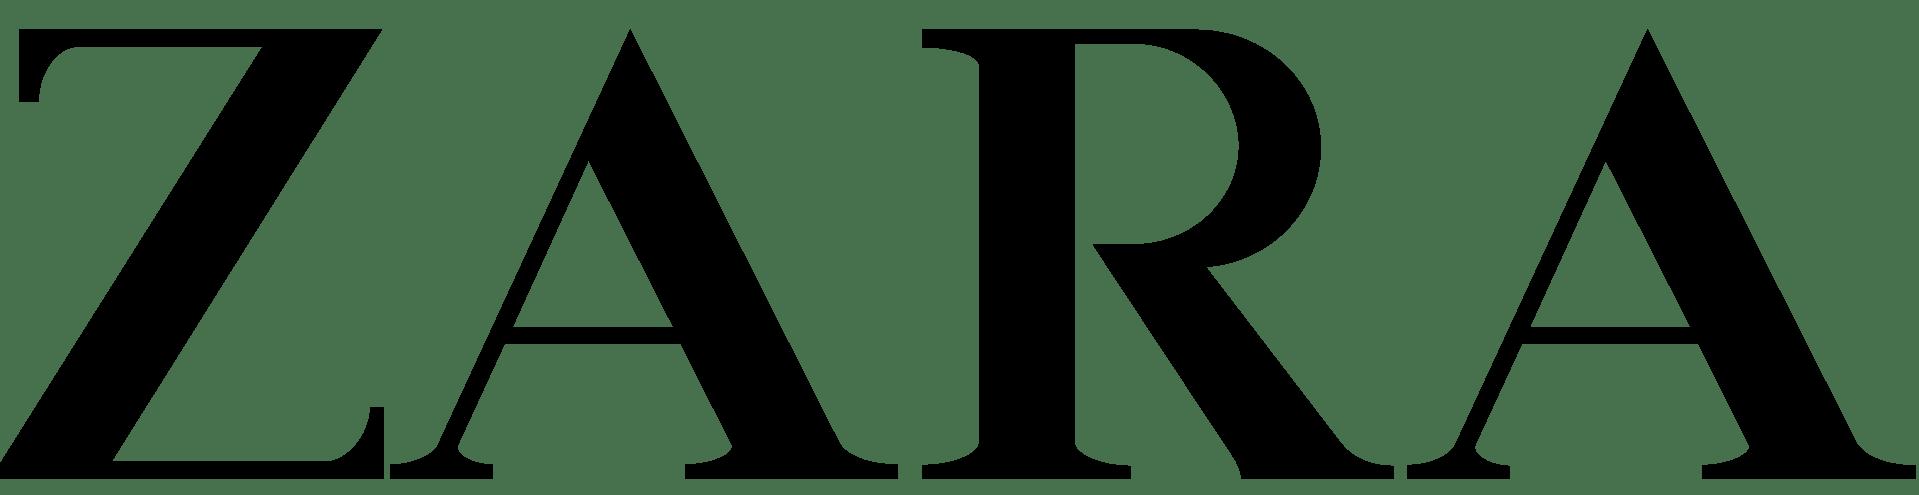 ZARA Competitors, Revenue and Employees - Owler Company Profile